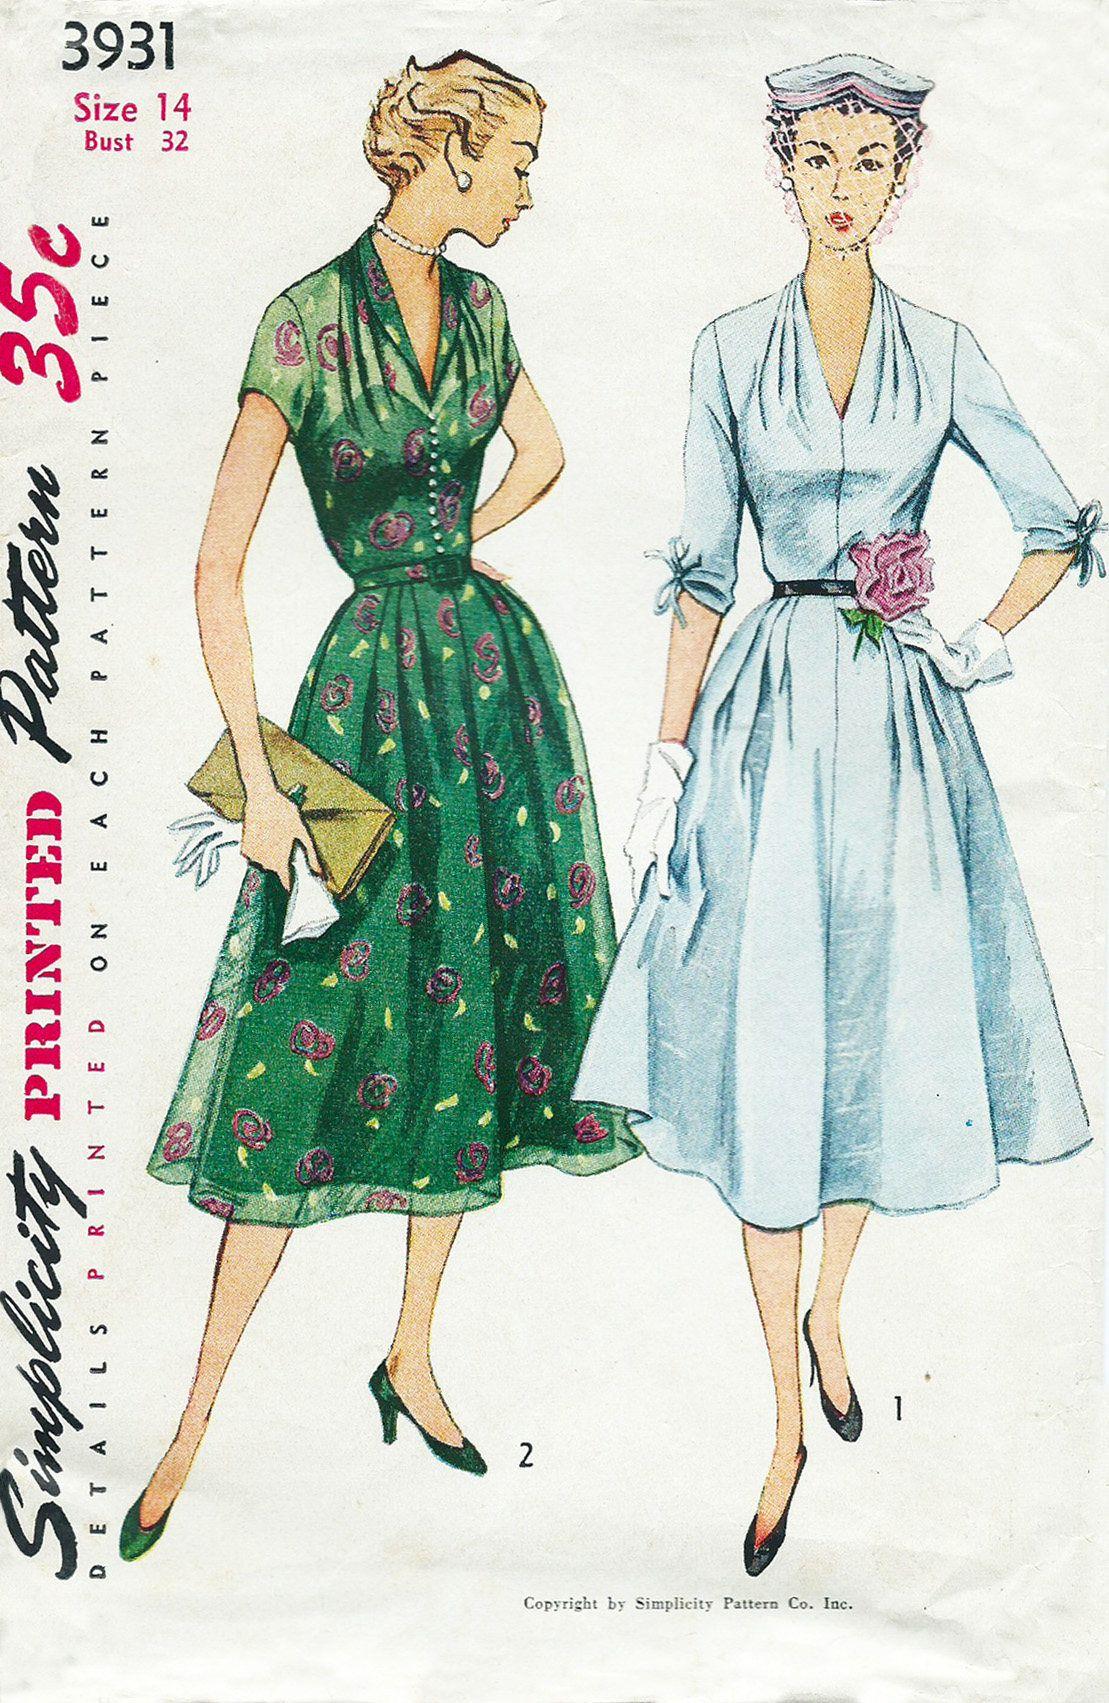 Pdf Sewing Pattern Stunning 1950s Vintage Dress Pattern Repro Size 14 Bust 32 By Vintagepatternvau Vintage Dress Patterns Vintage Dresses Vintage 1950s Dresses